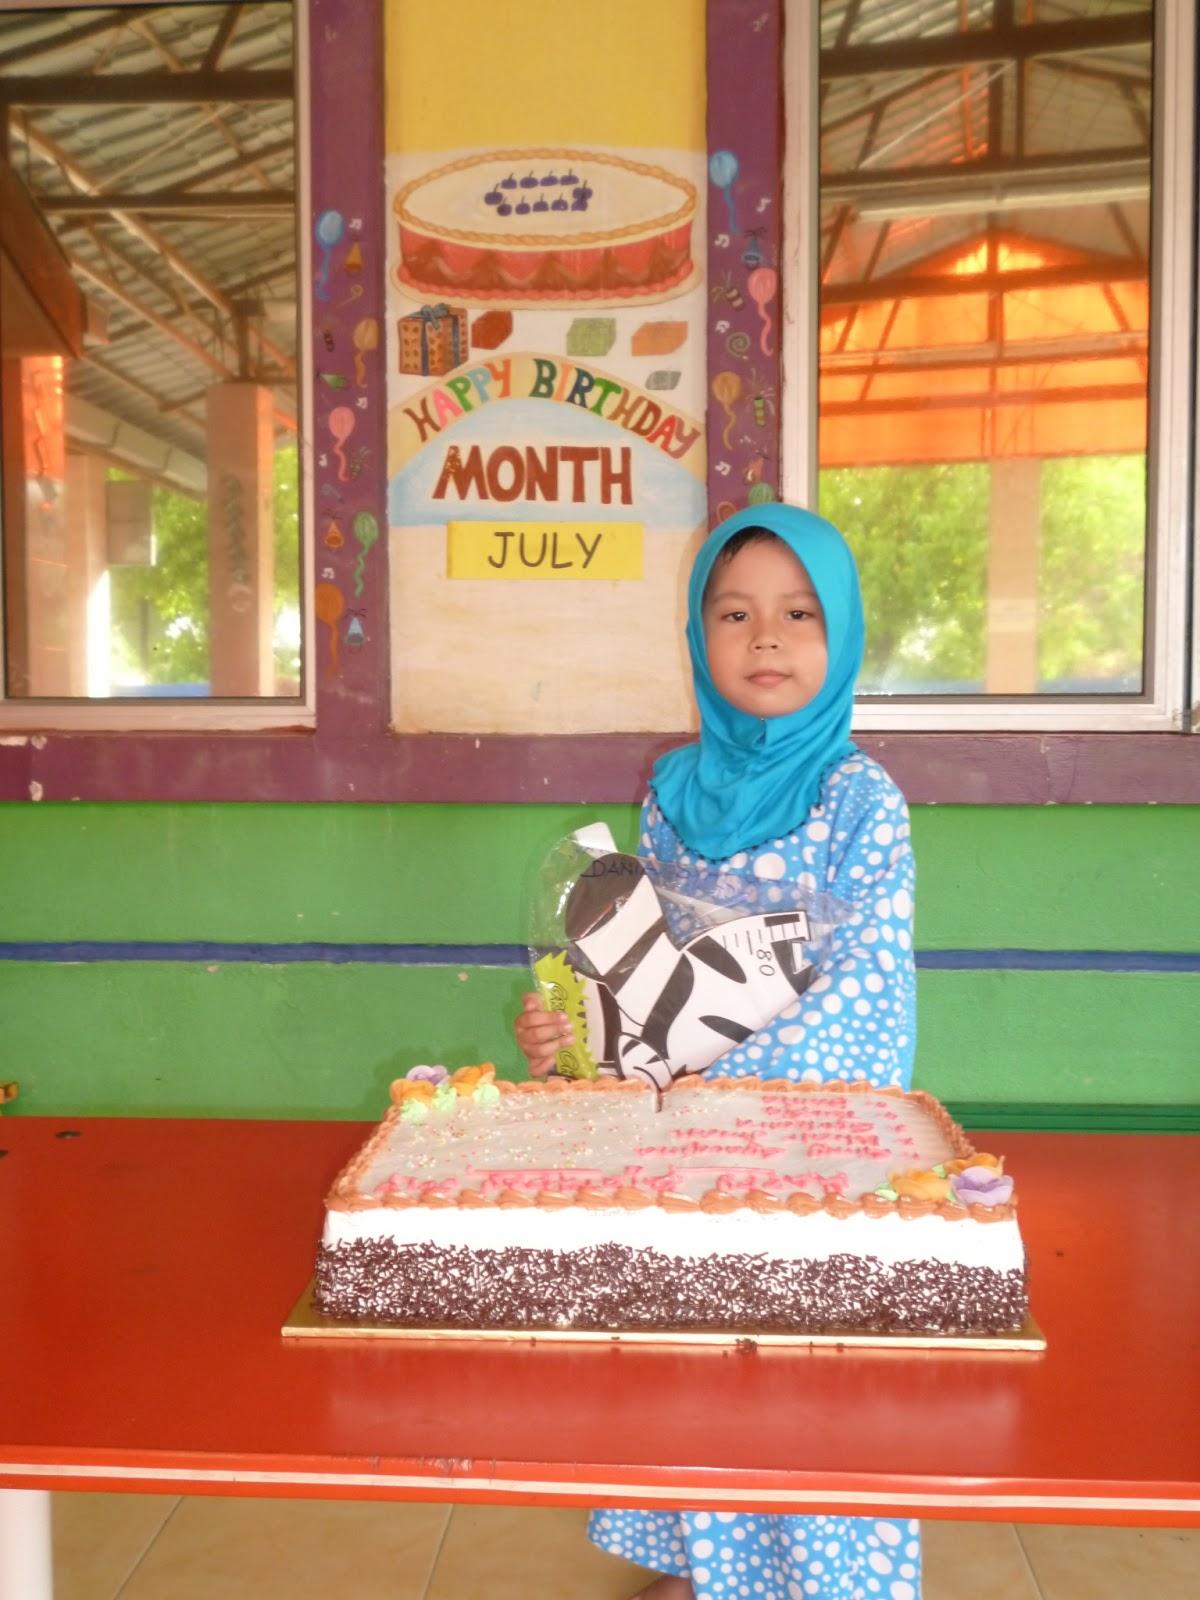 Tadika Tunas Ceria Bestari: BIRTHDAY OF THE MONTH: JULY 2013